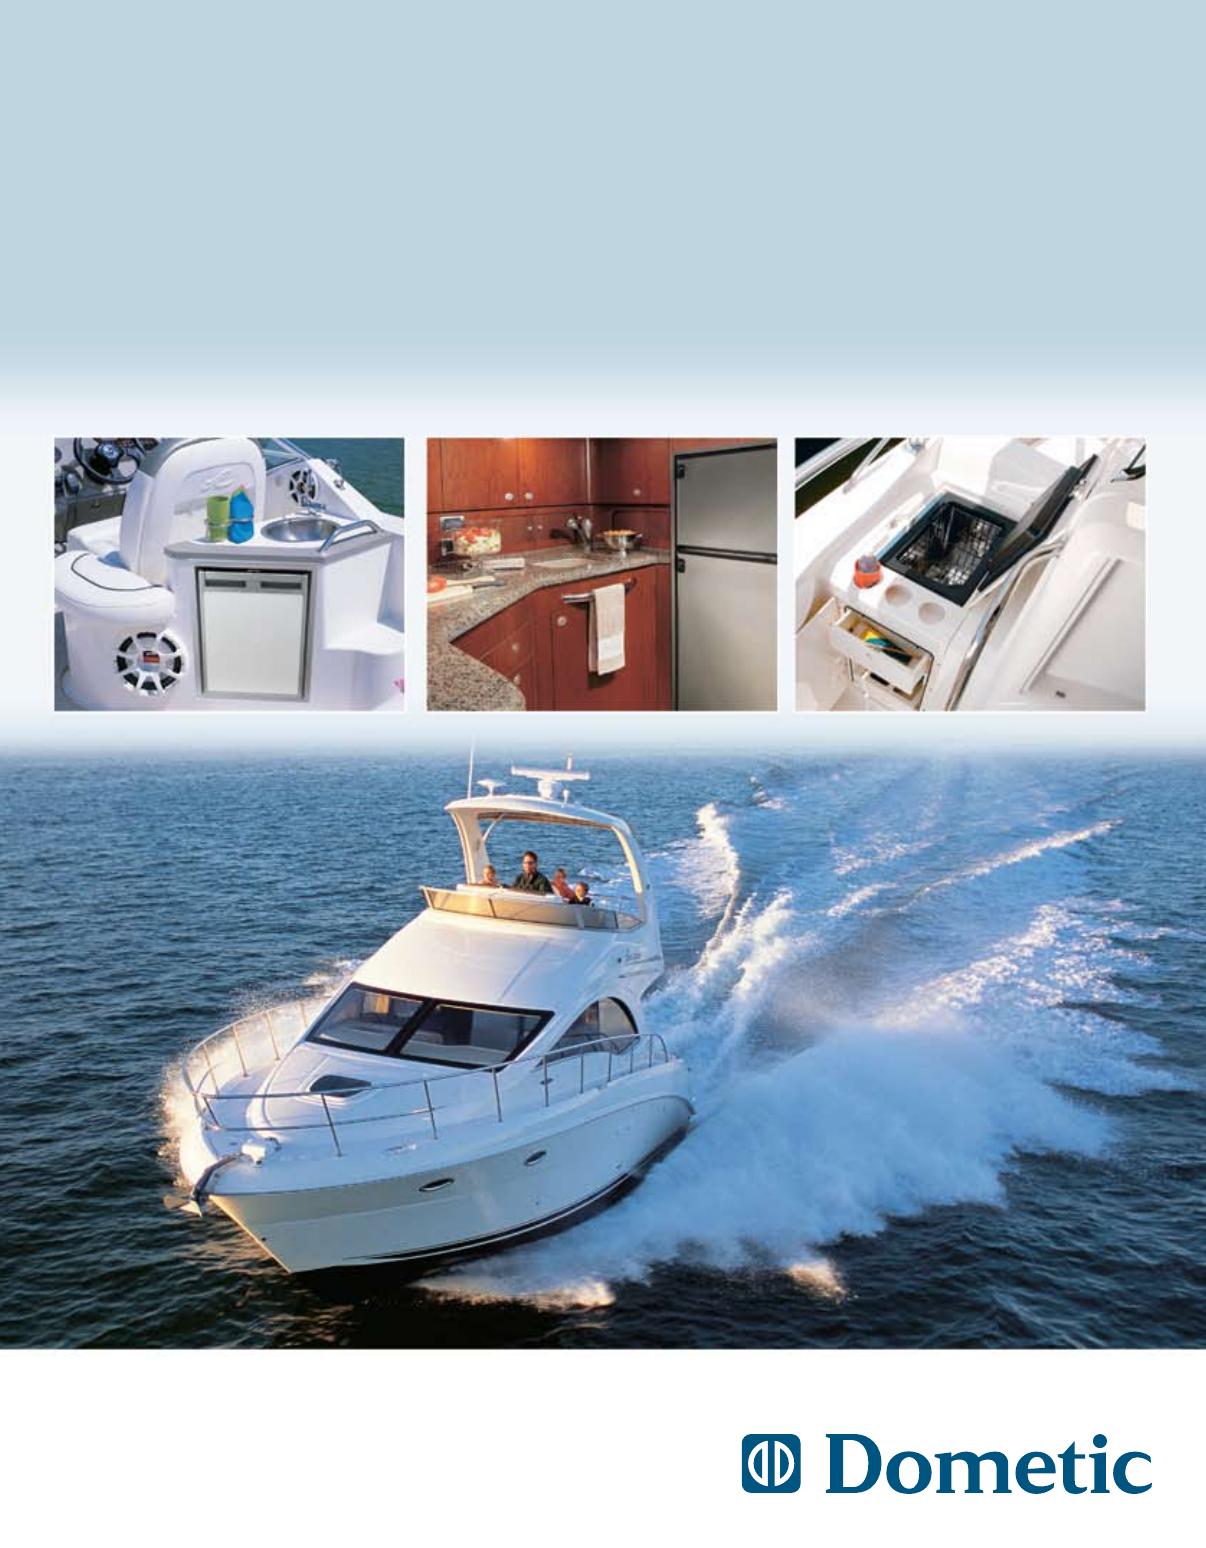 Dometic L 0191B User Manual To The 5a9ec200 7c60 48b4 a920 b2e628429309